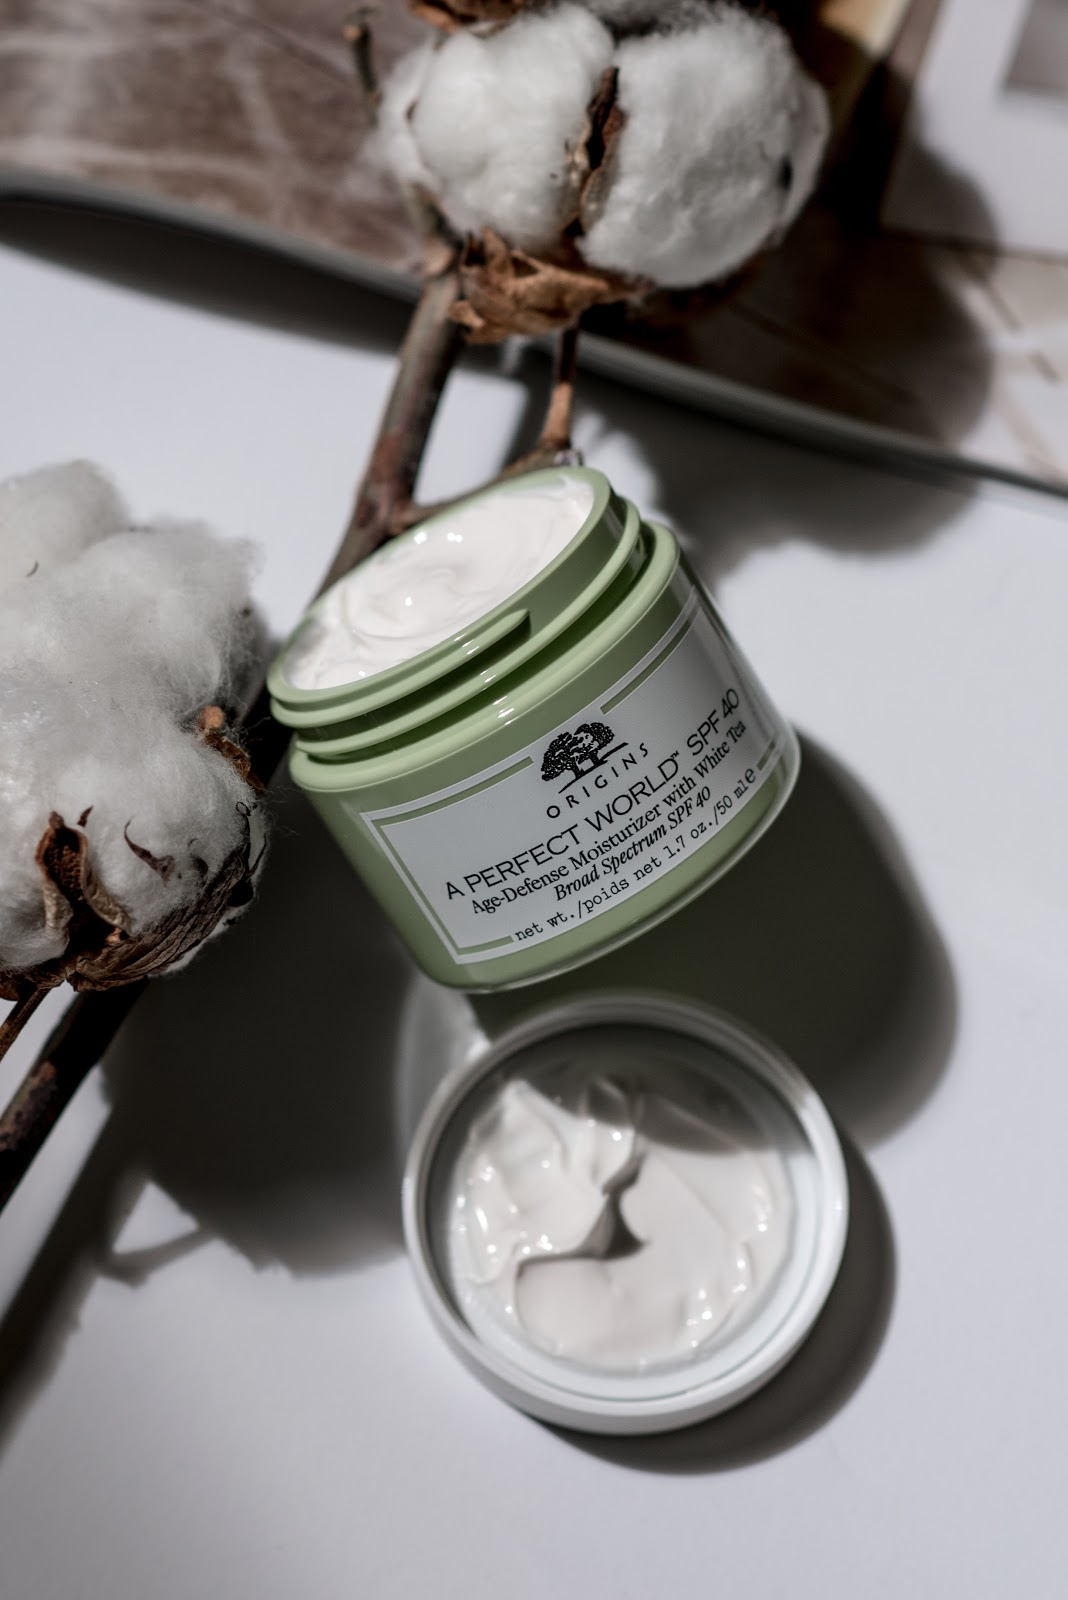 von vogue favourite sun care products sun protection origins age defense moisturizer spf 40